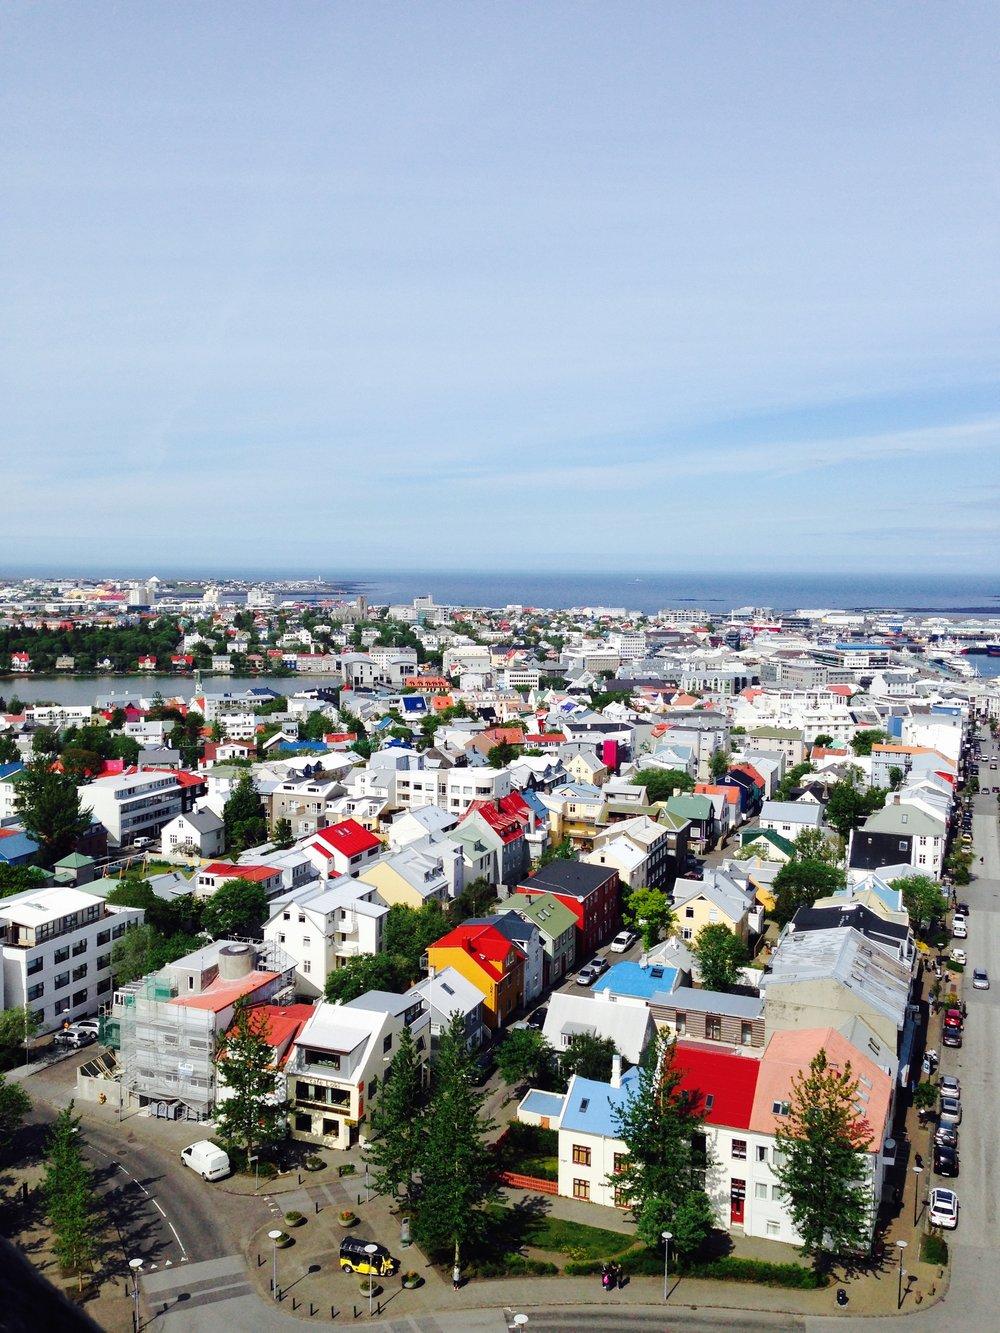 iceland-reykjavik-hallgrimskirkja-church-view.jpg